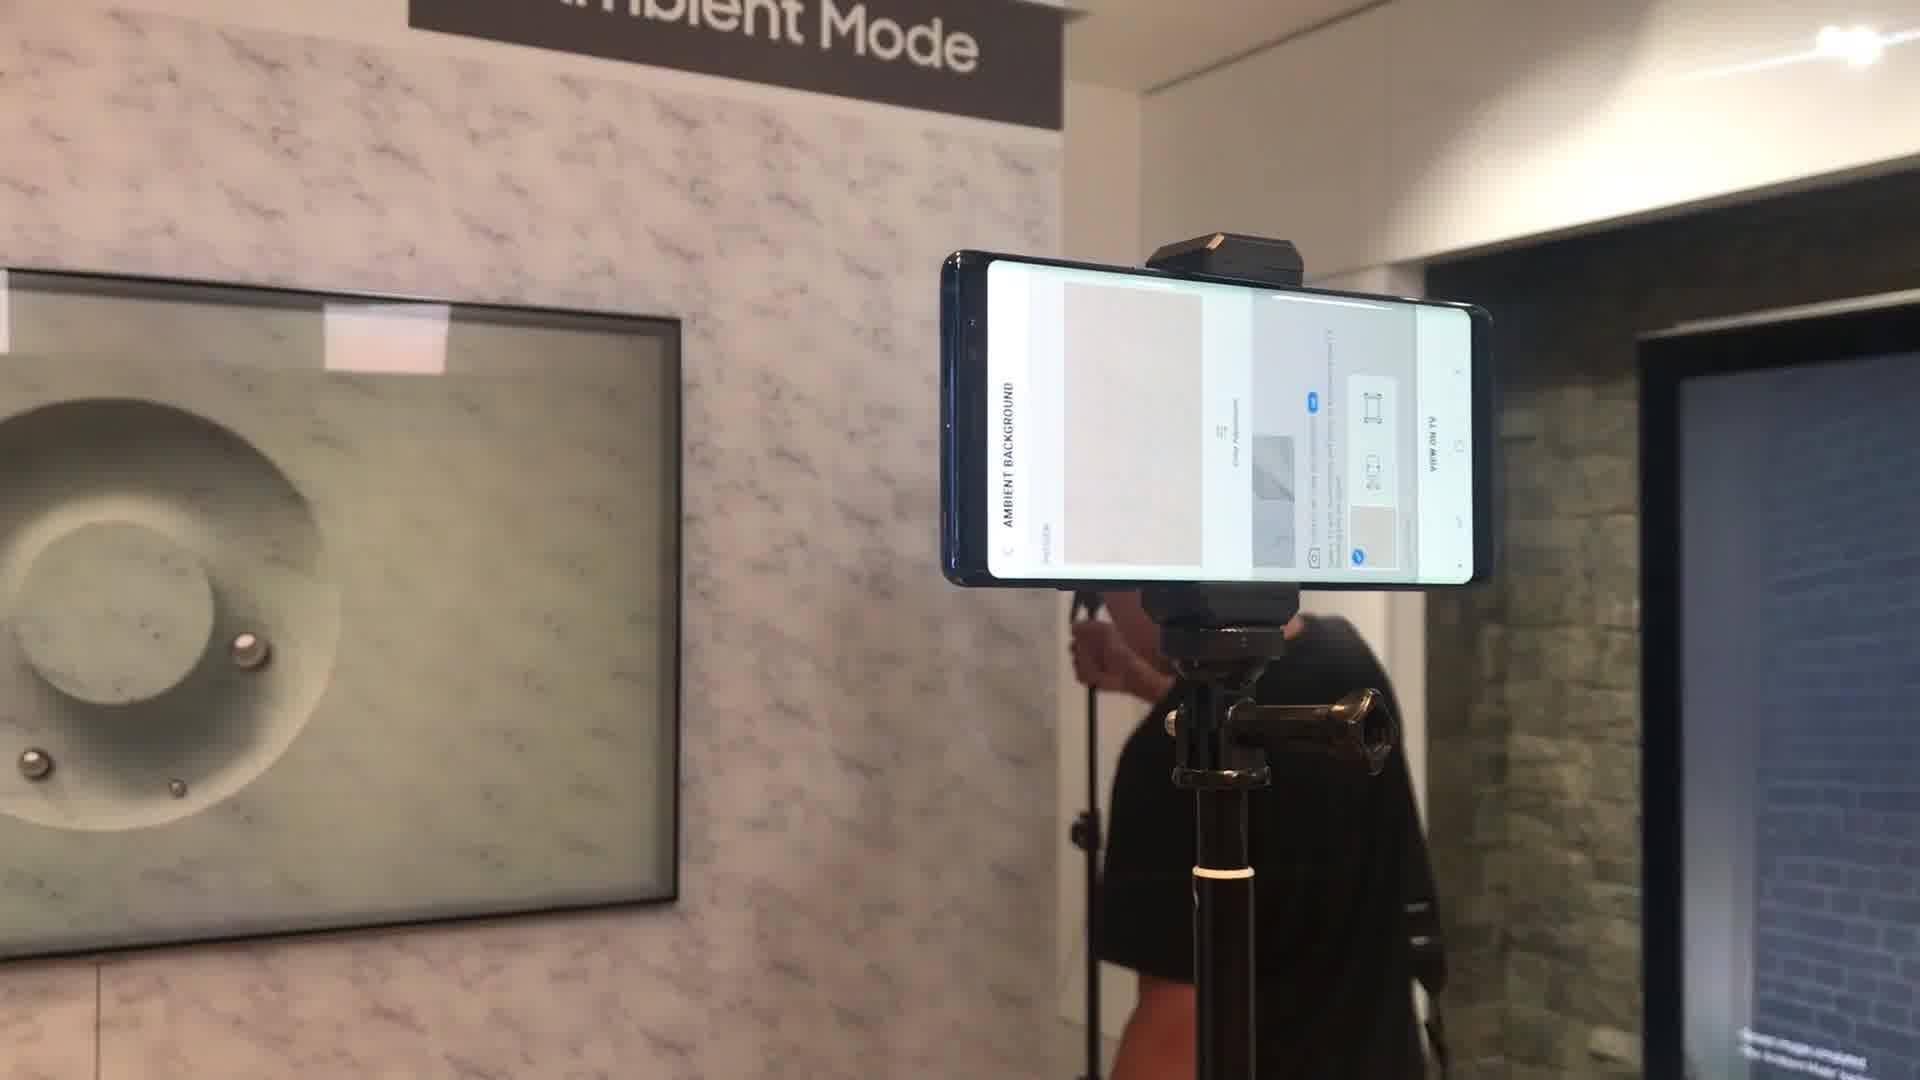 【CMK實拍】Samsung -「環境模式」(Ambient Mode)